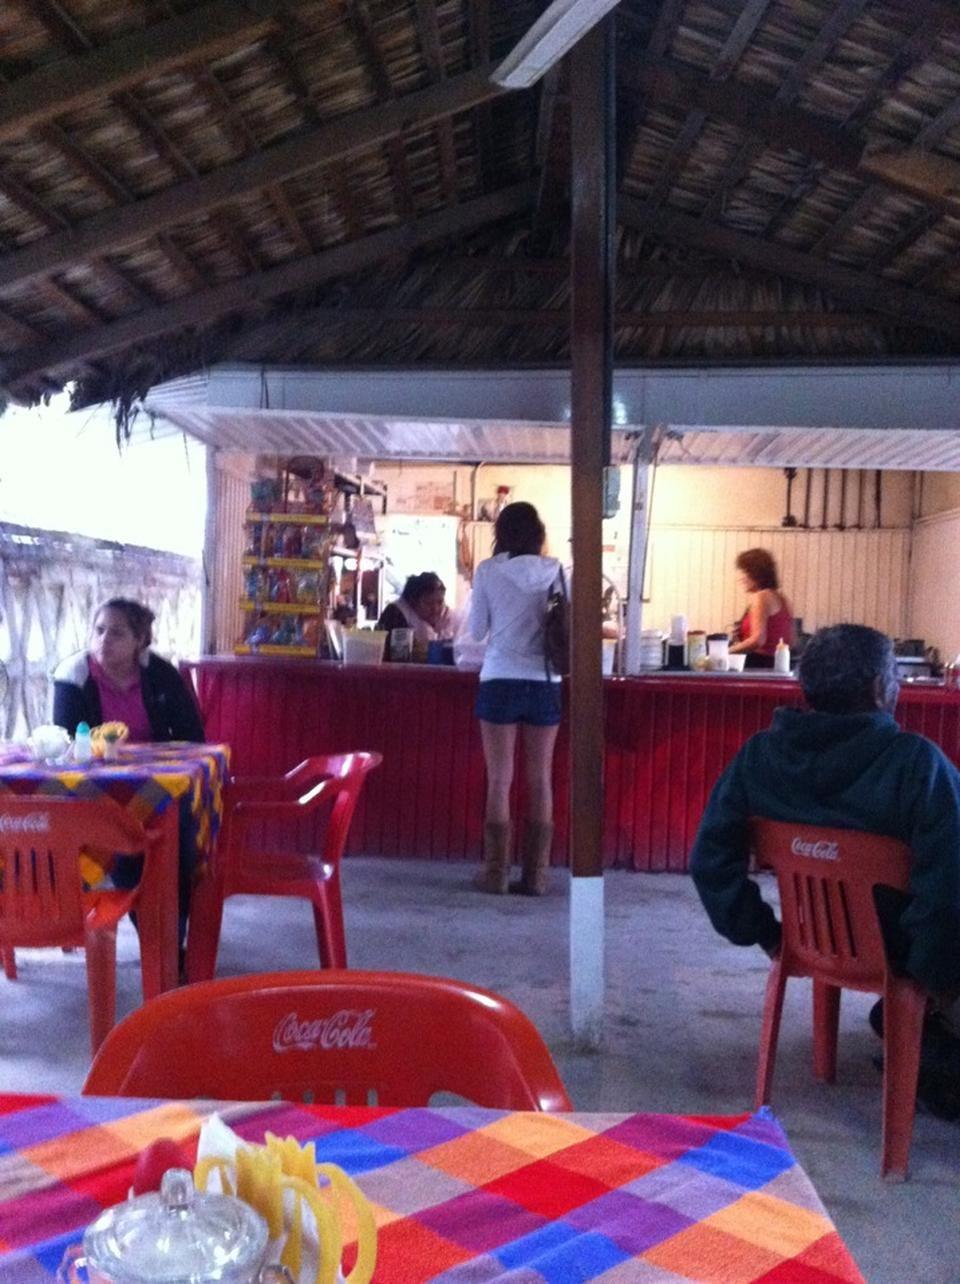 Loncheria Karla - Café